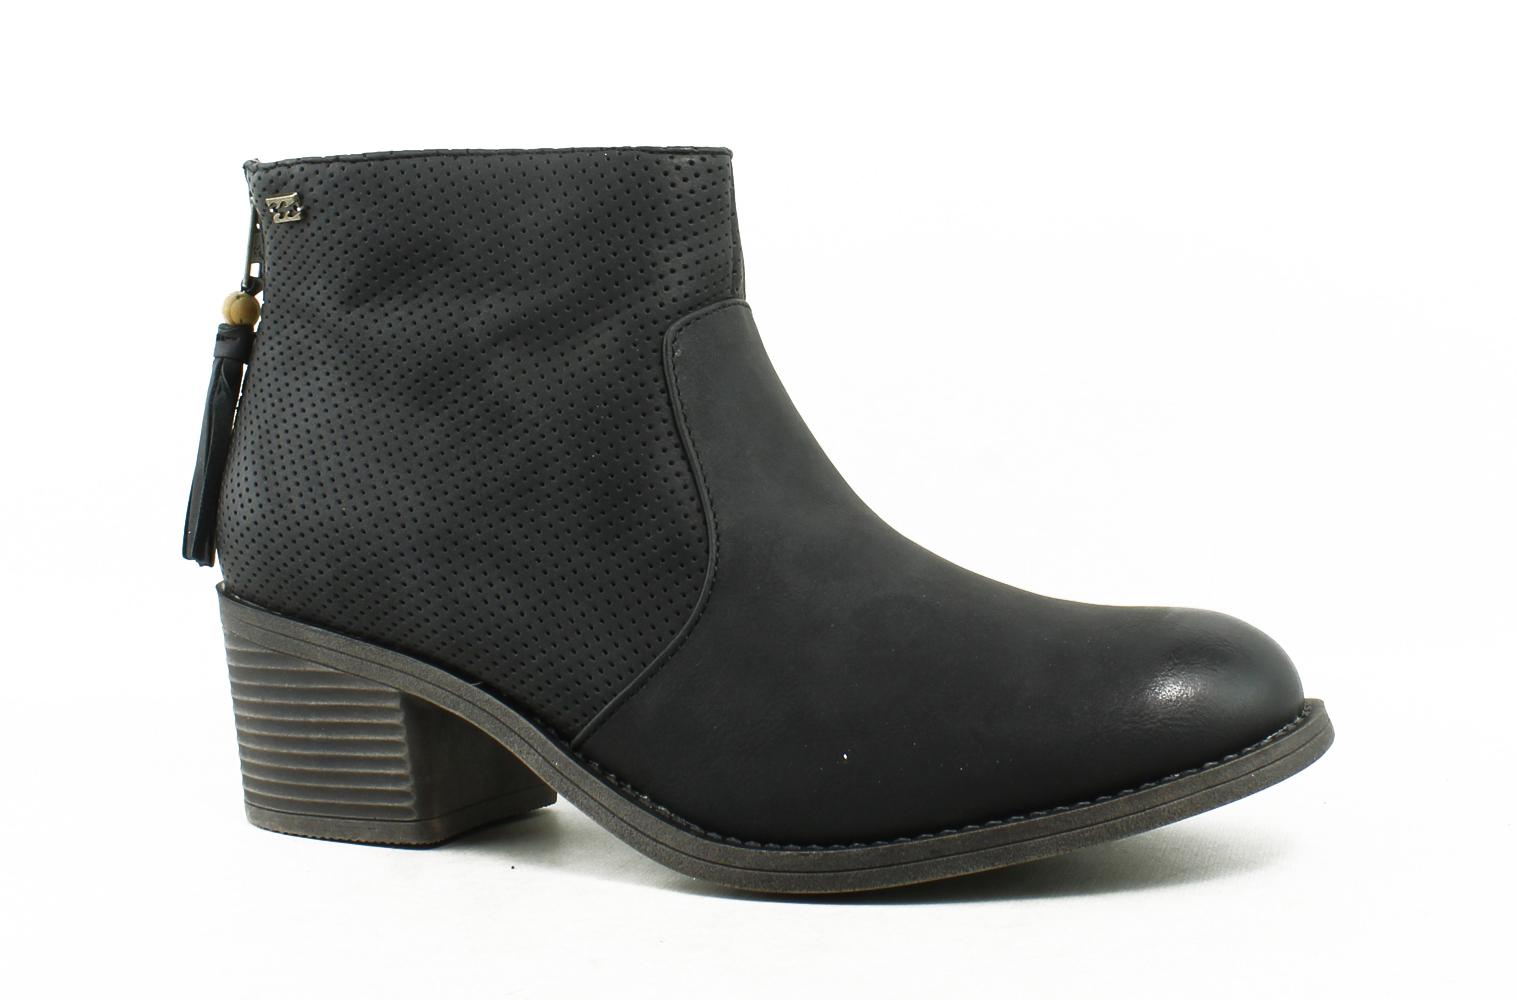 NEU Billabong Damenschuhe Jaftltal Off Ankle Stiefel Größe 8.5